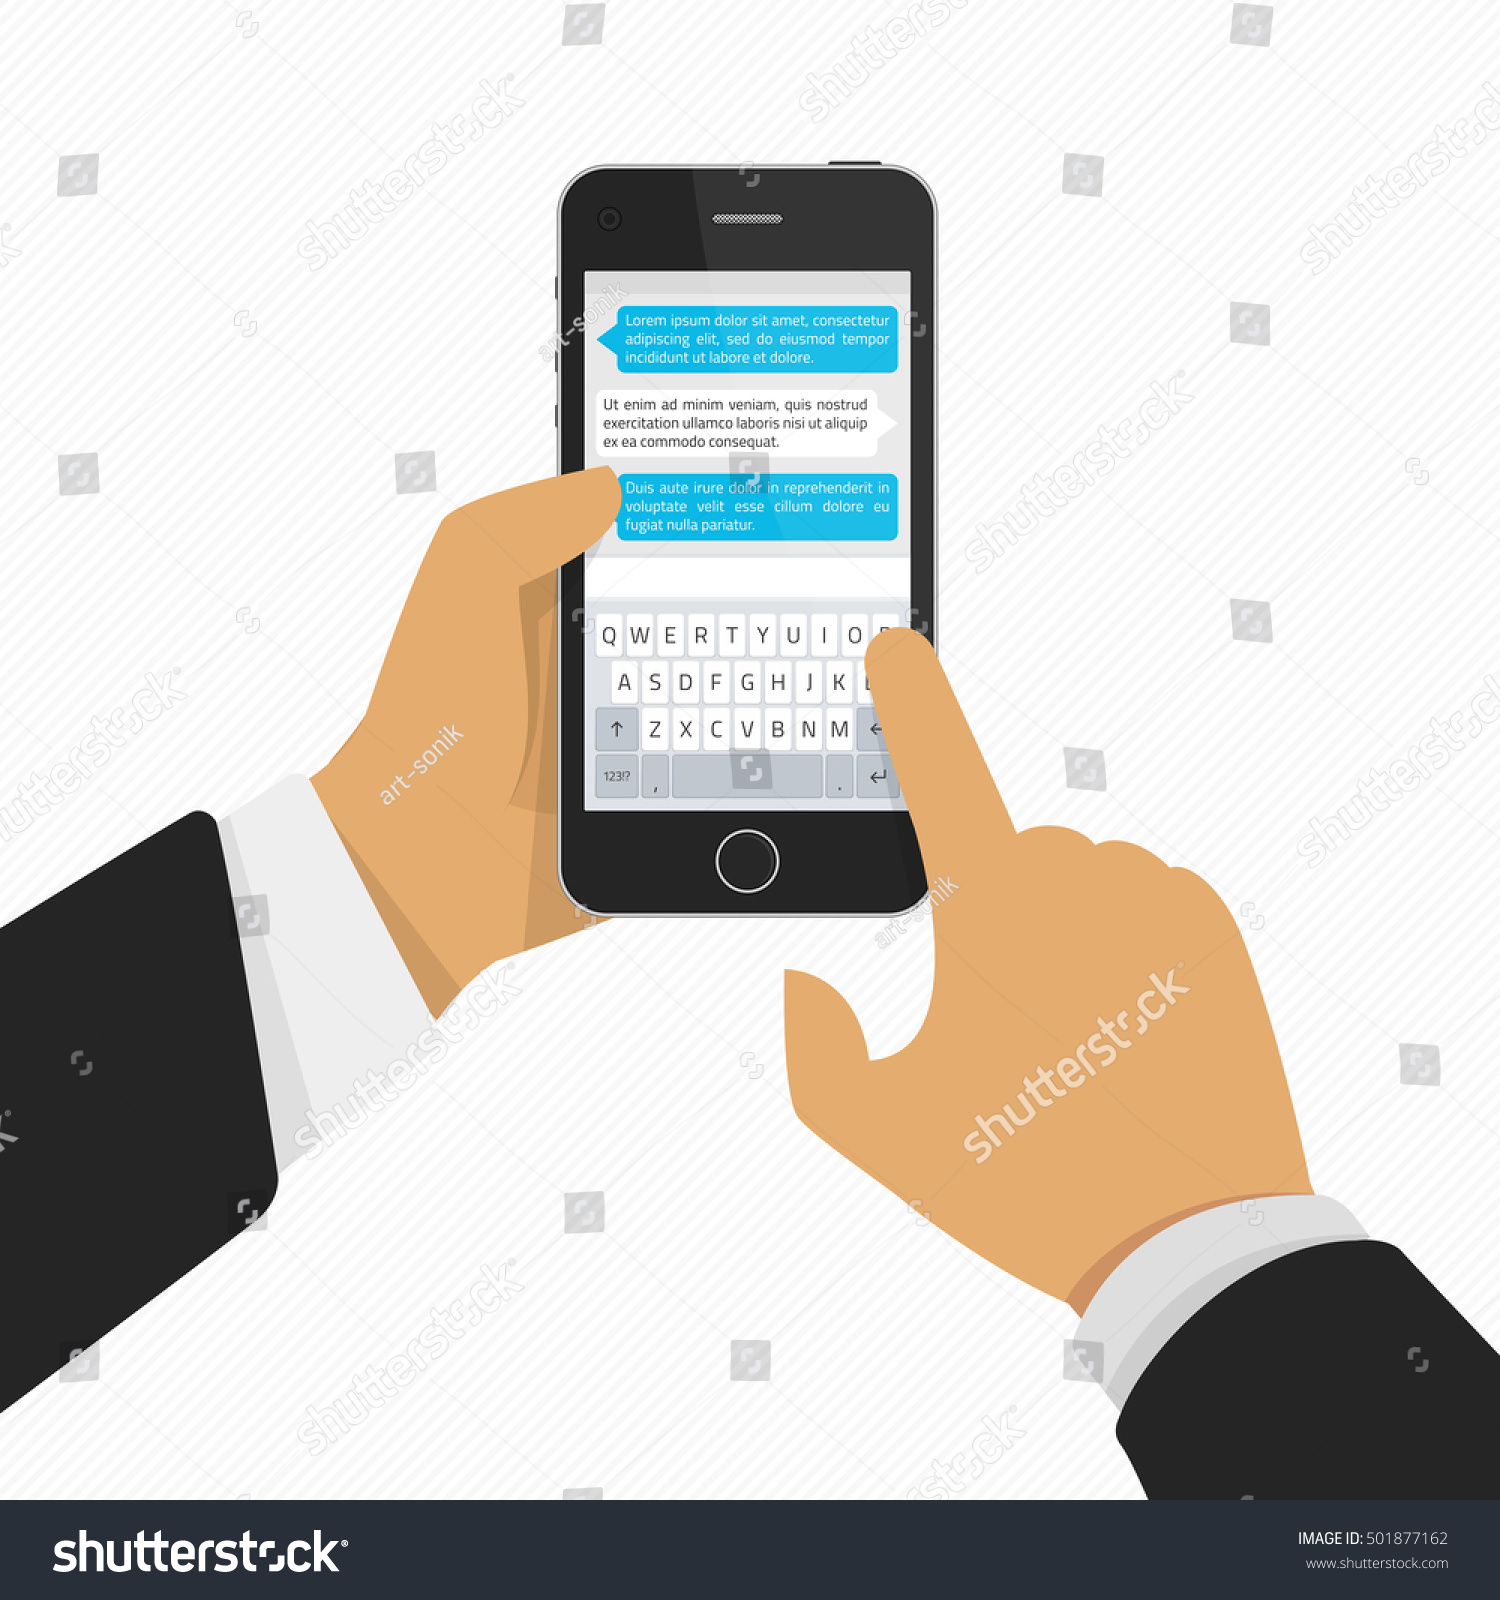 hand holding phone keyboard phone message stock vector 501877162 shutterstock. Black Bedroom Furniture Sets. Home Design Ideas